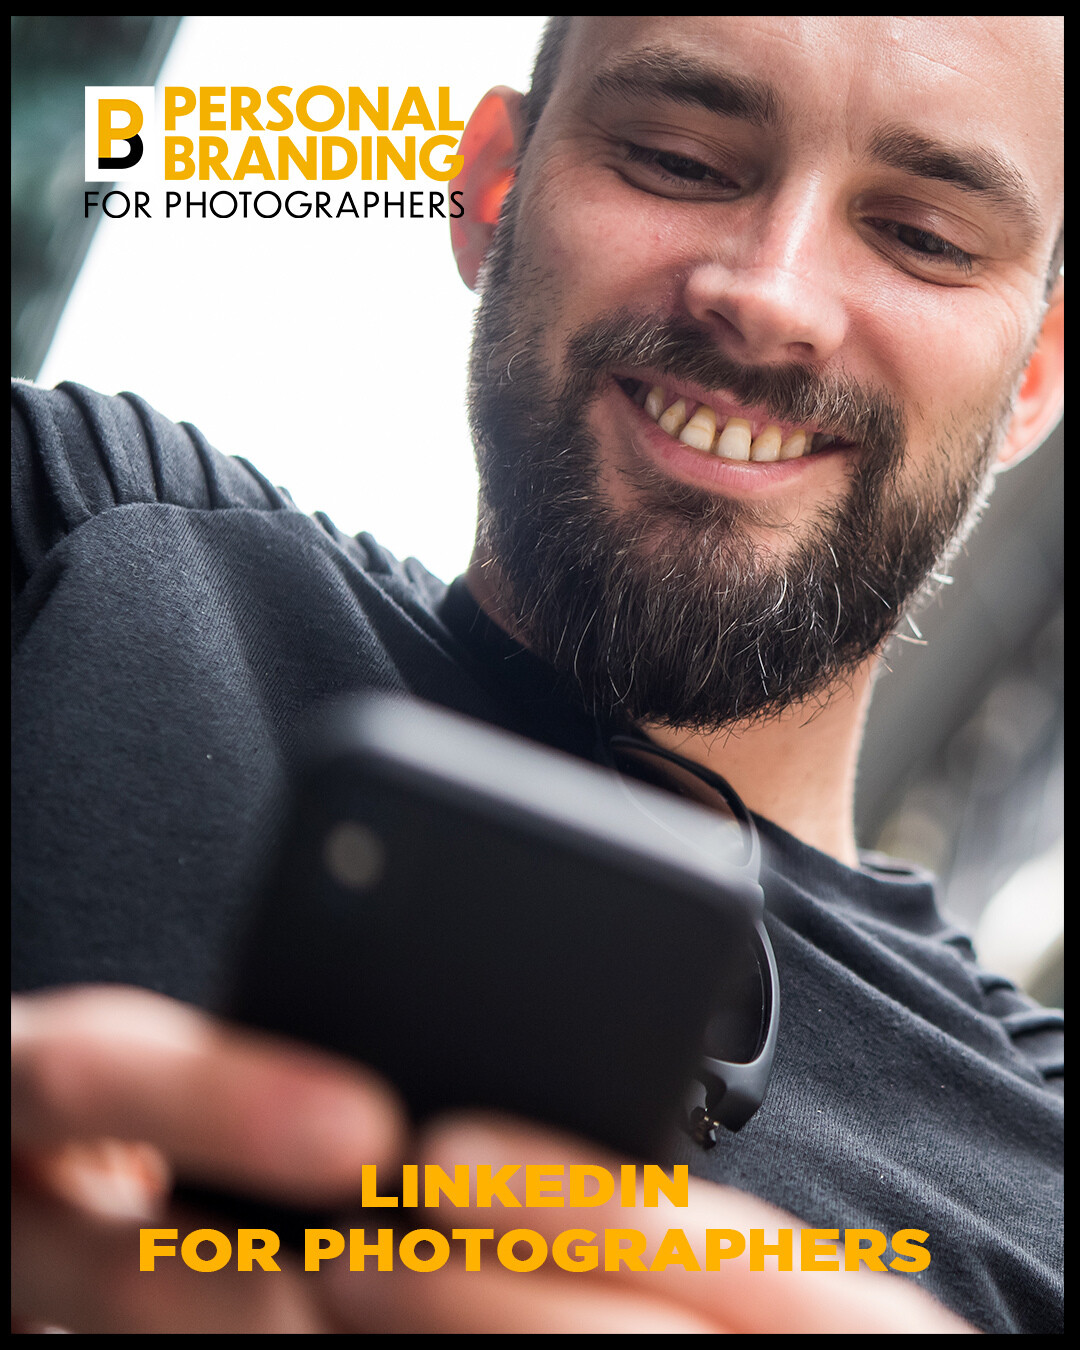 LinkedIn for Photographers